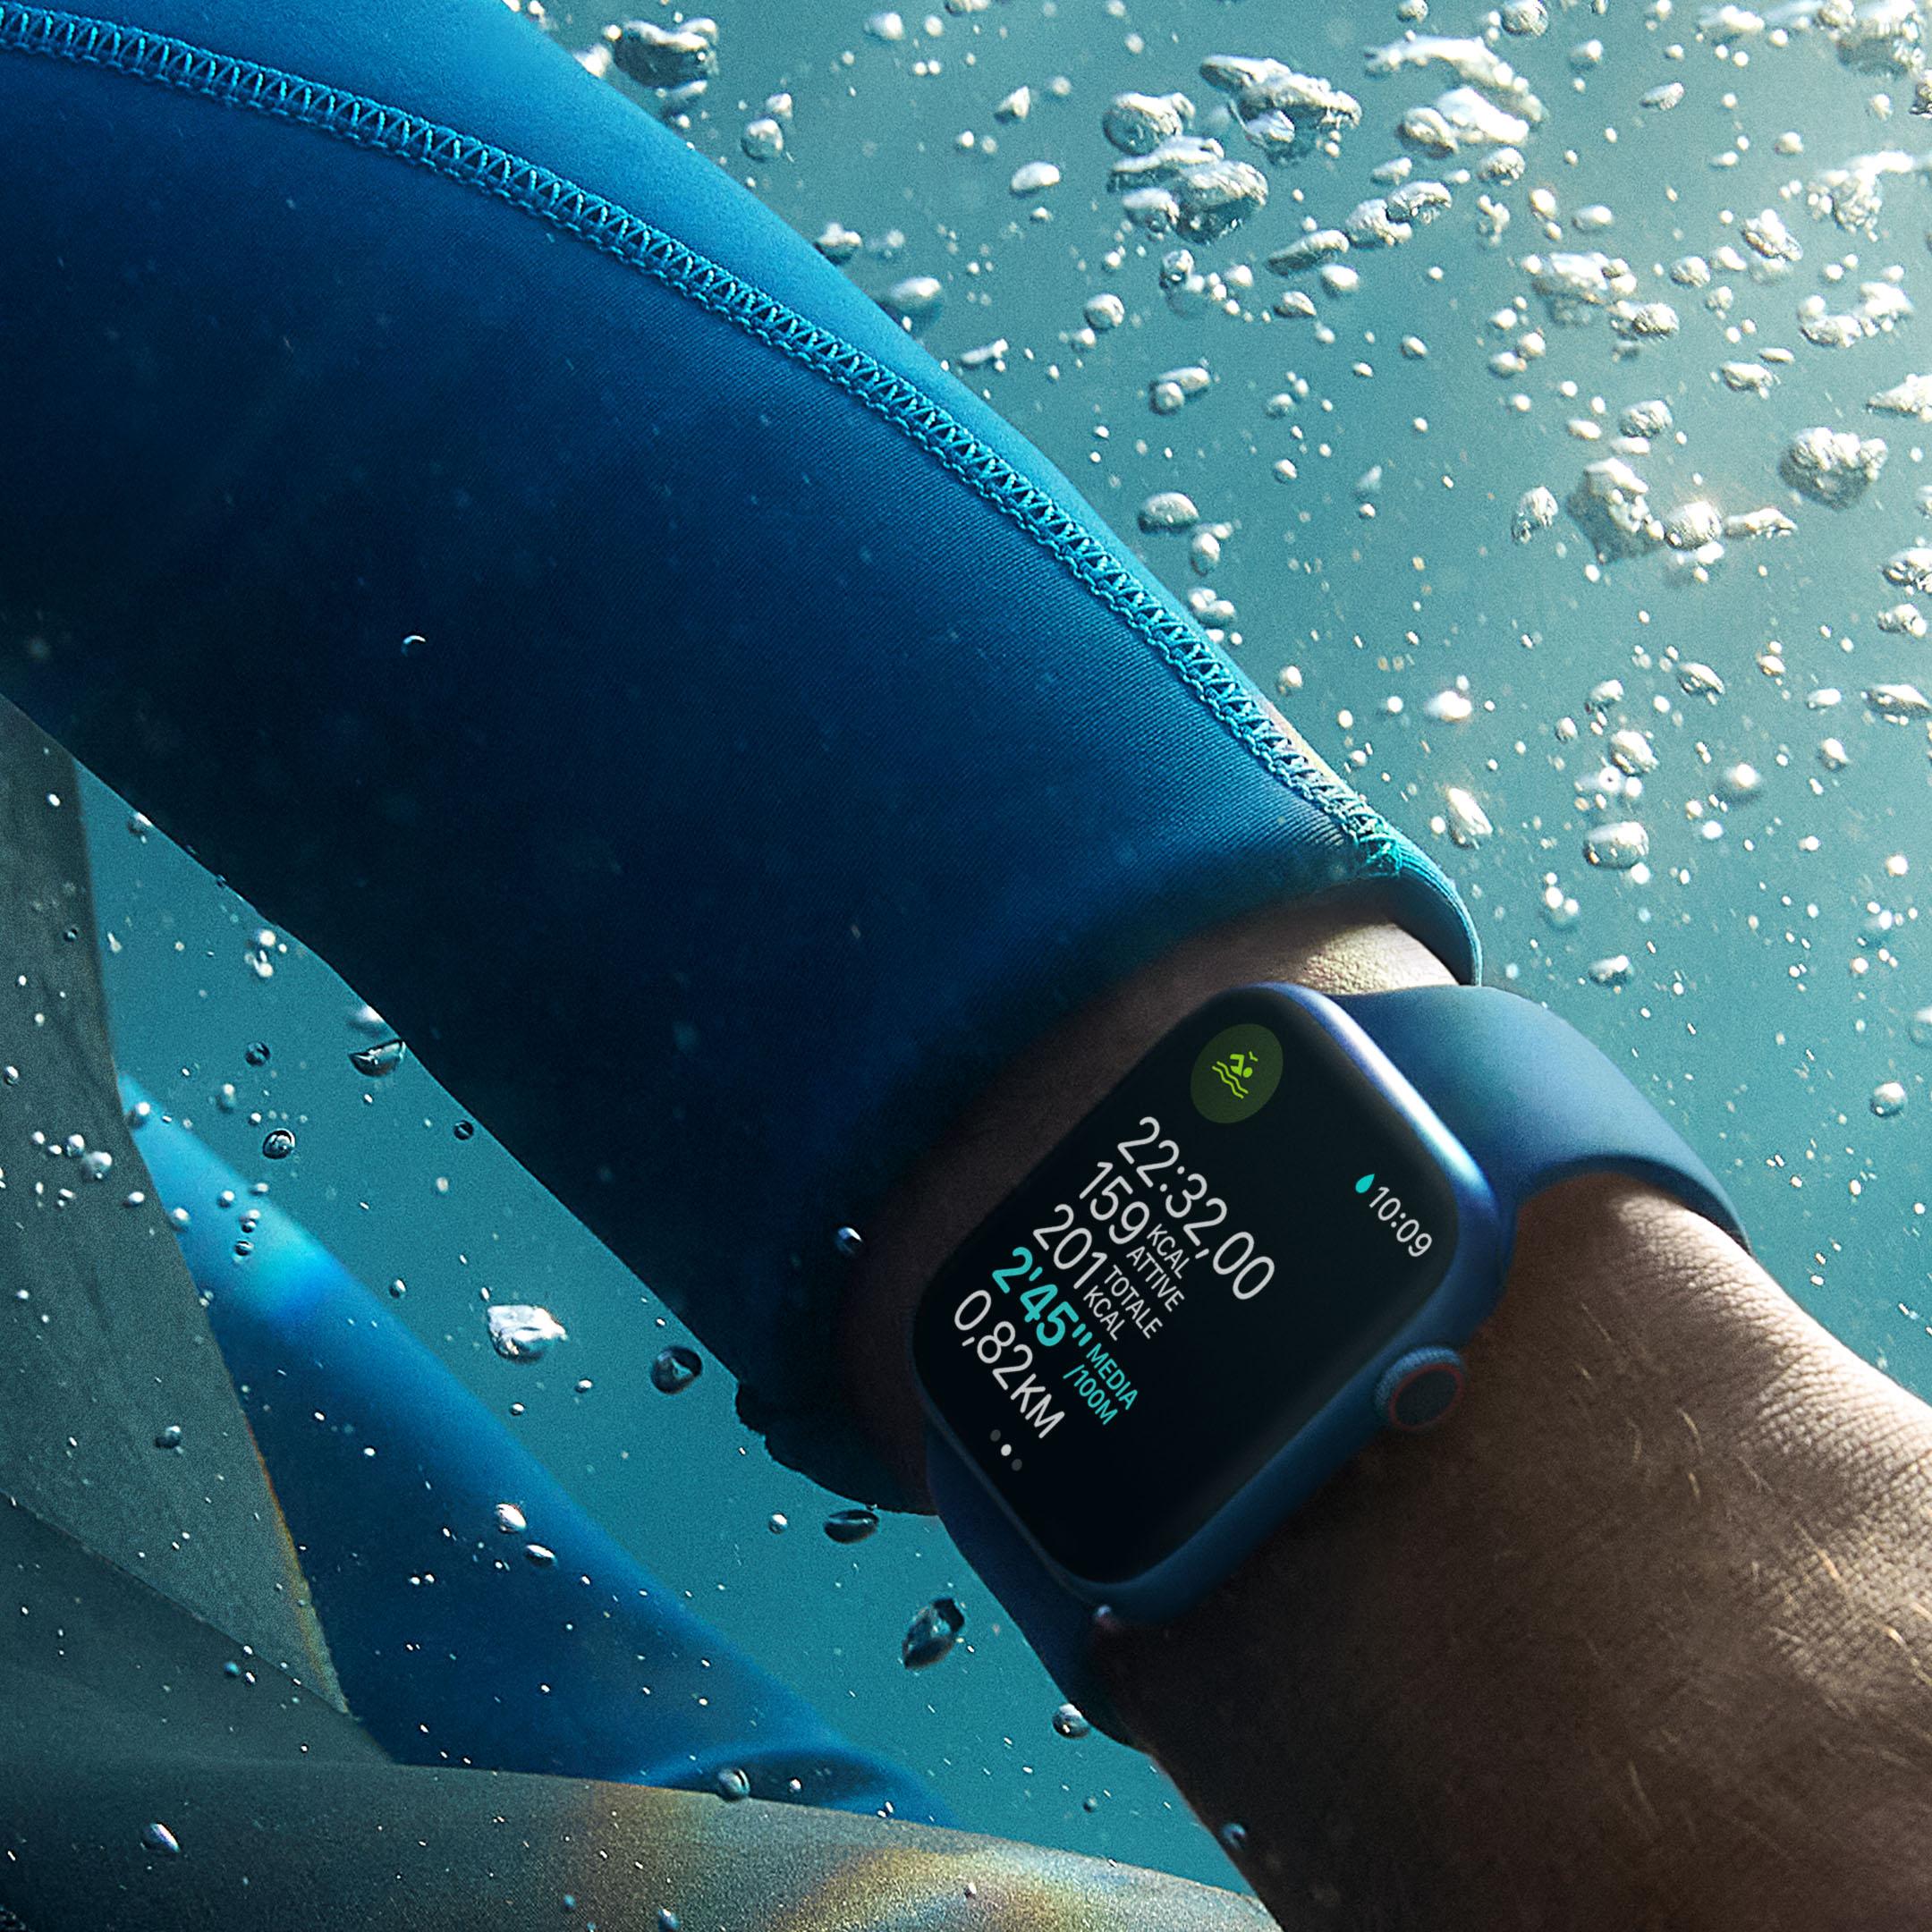 Apple Watch resistente acqua